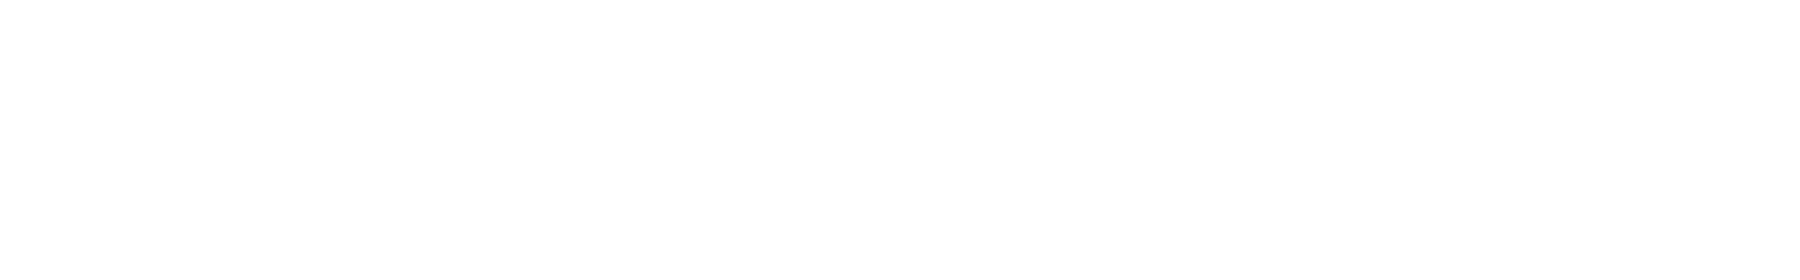 808  spinz